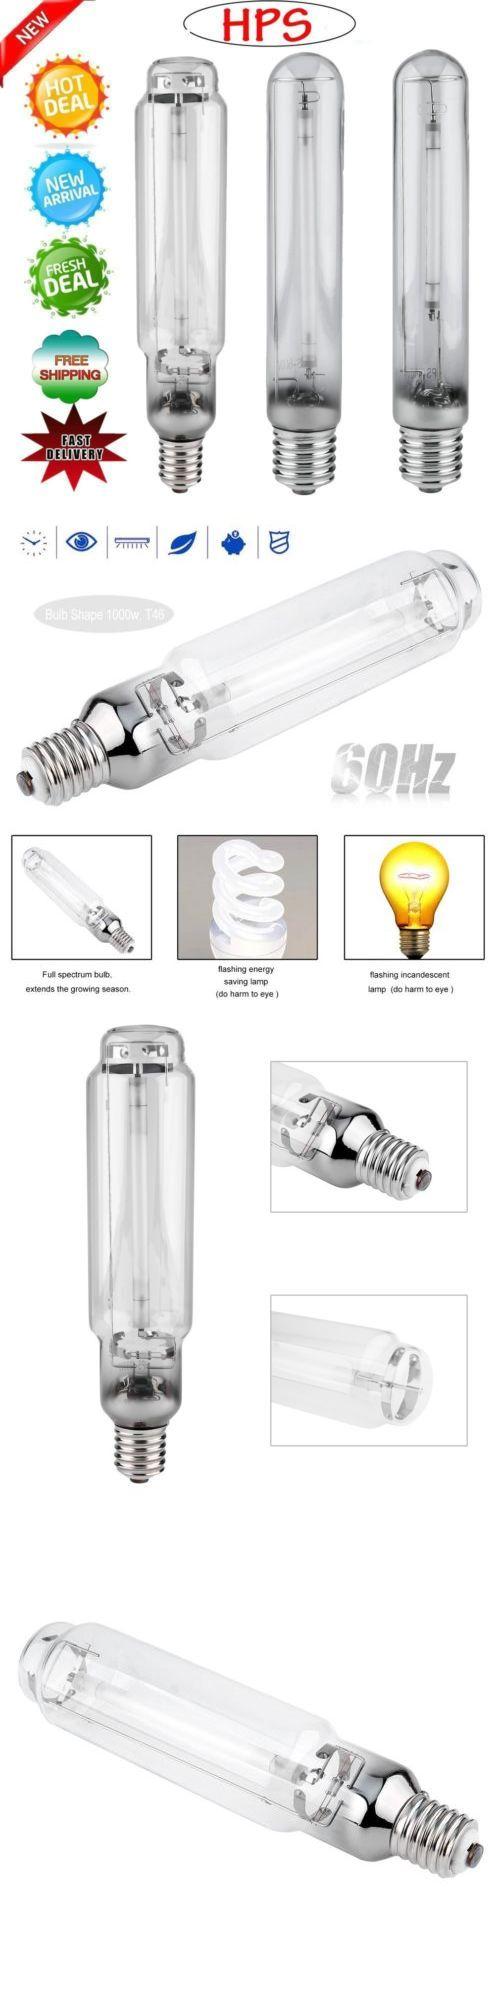 Grow Light Bulbs 178988 1000w 600w 400w Watt Super Hps High Pressure Sodium Grow Light Bulb Lamp Hm2 Buy It No Light Bulb Lamp Grow Light Bulbs Grow Lights